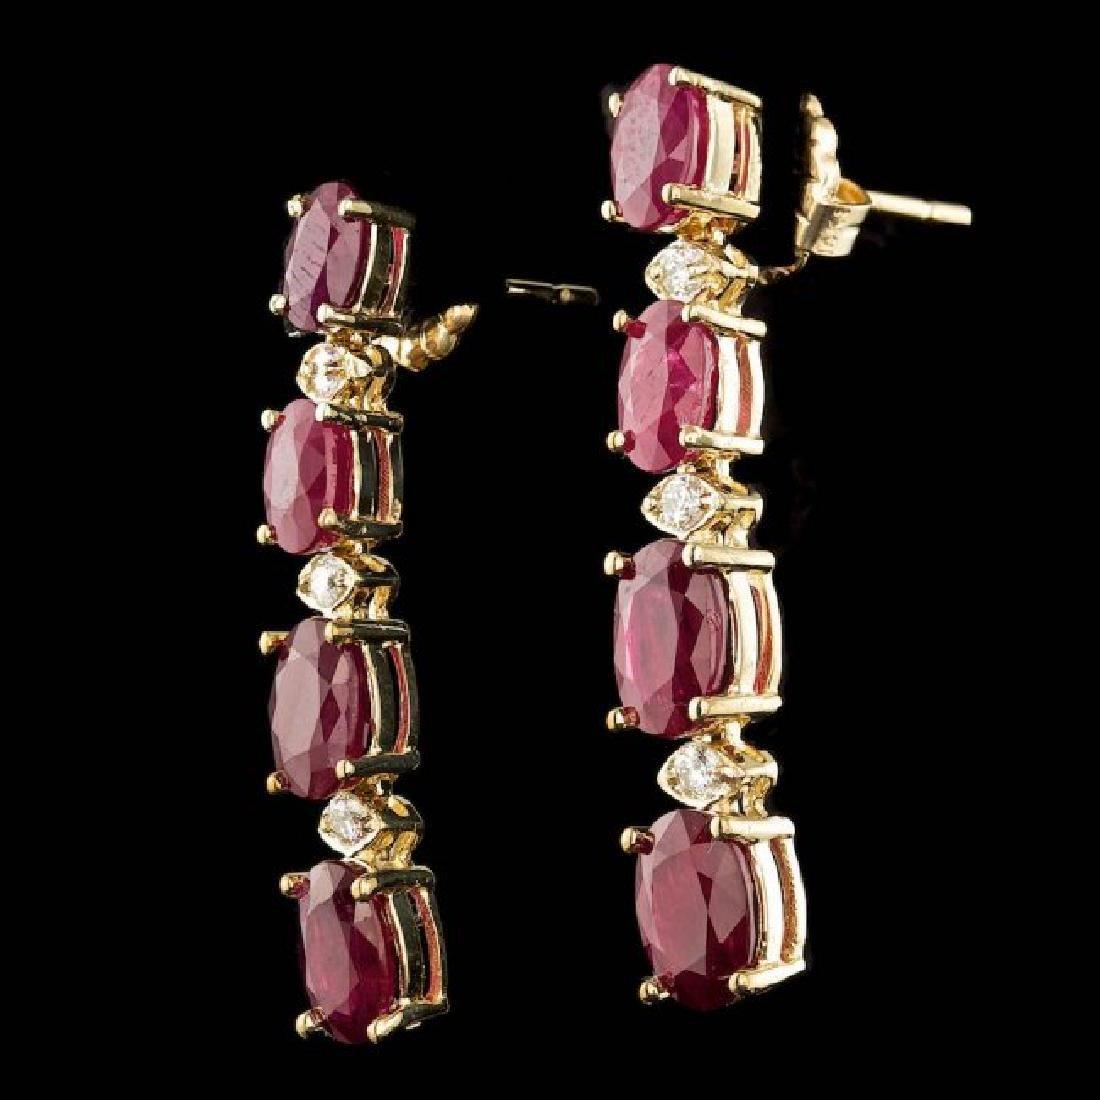 14k Gold 7.00ct Ruby 0.20ct Diamond Earrings - 2